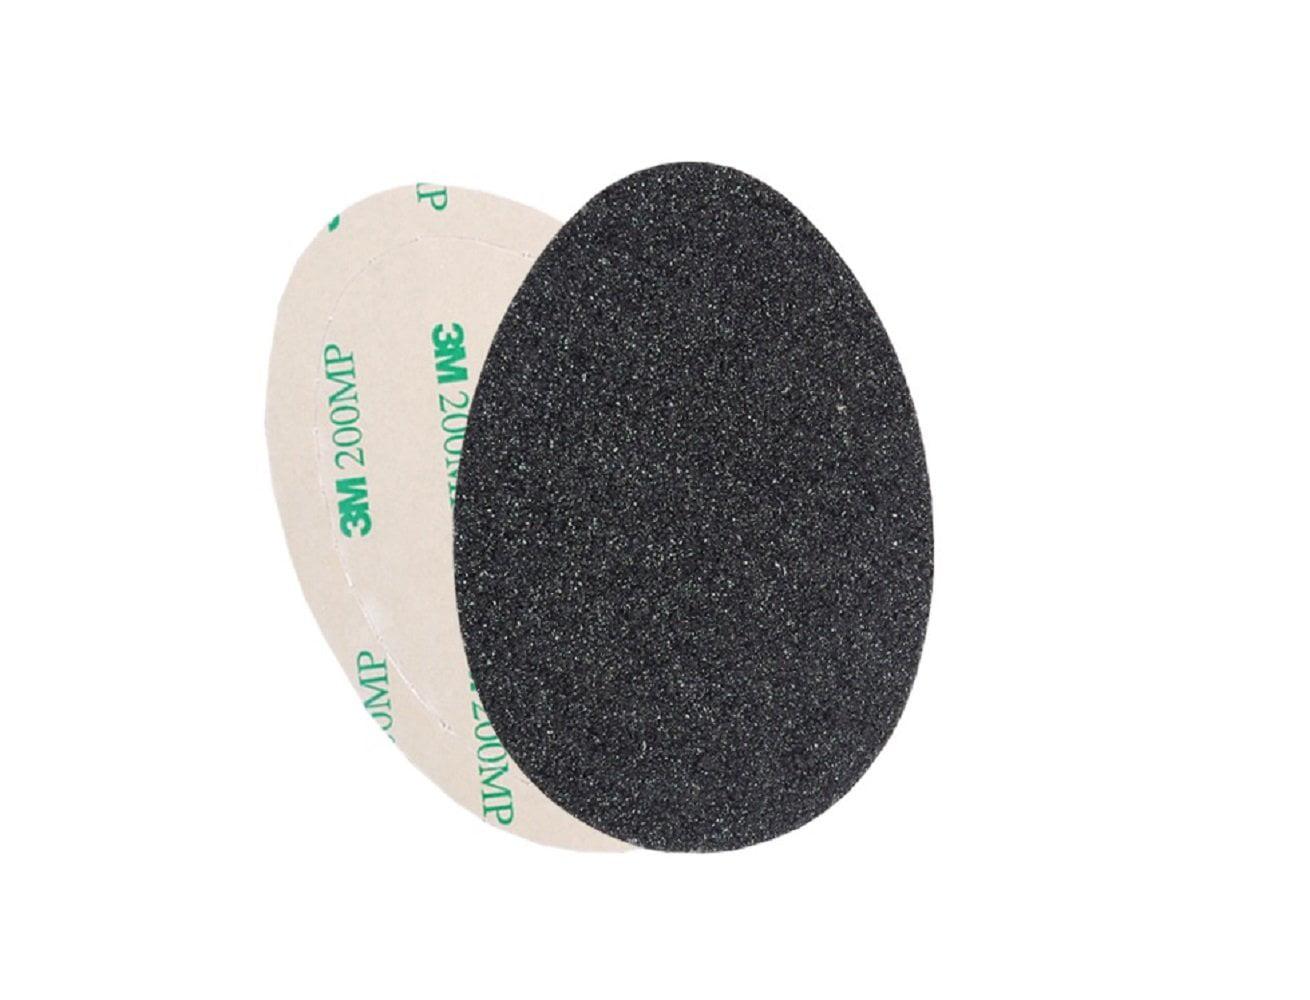 Non Slip Shoe Sole Protector Pads 3m Adhesive Anti-Slip Stick on Shoe Grip